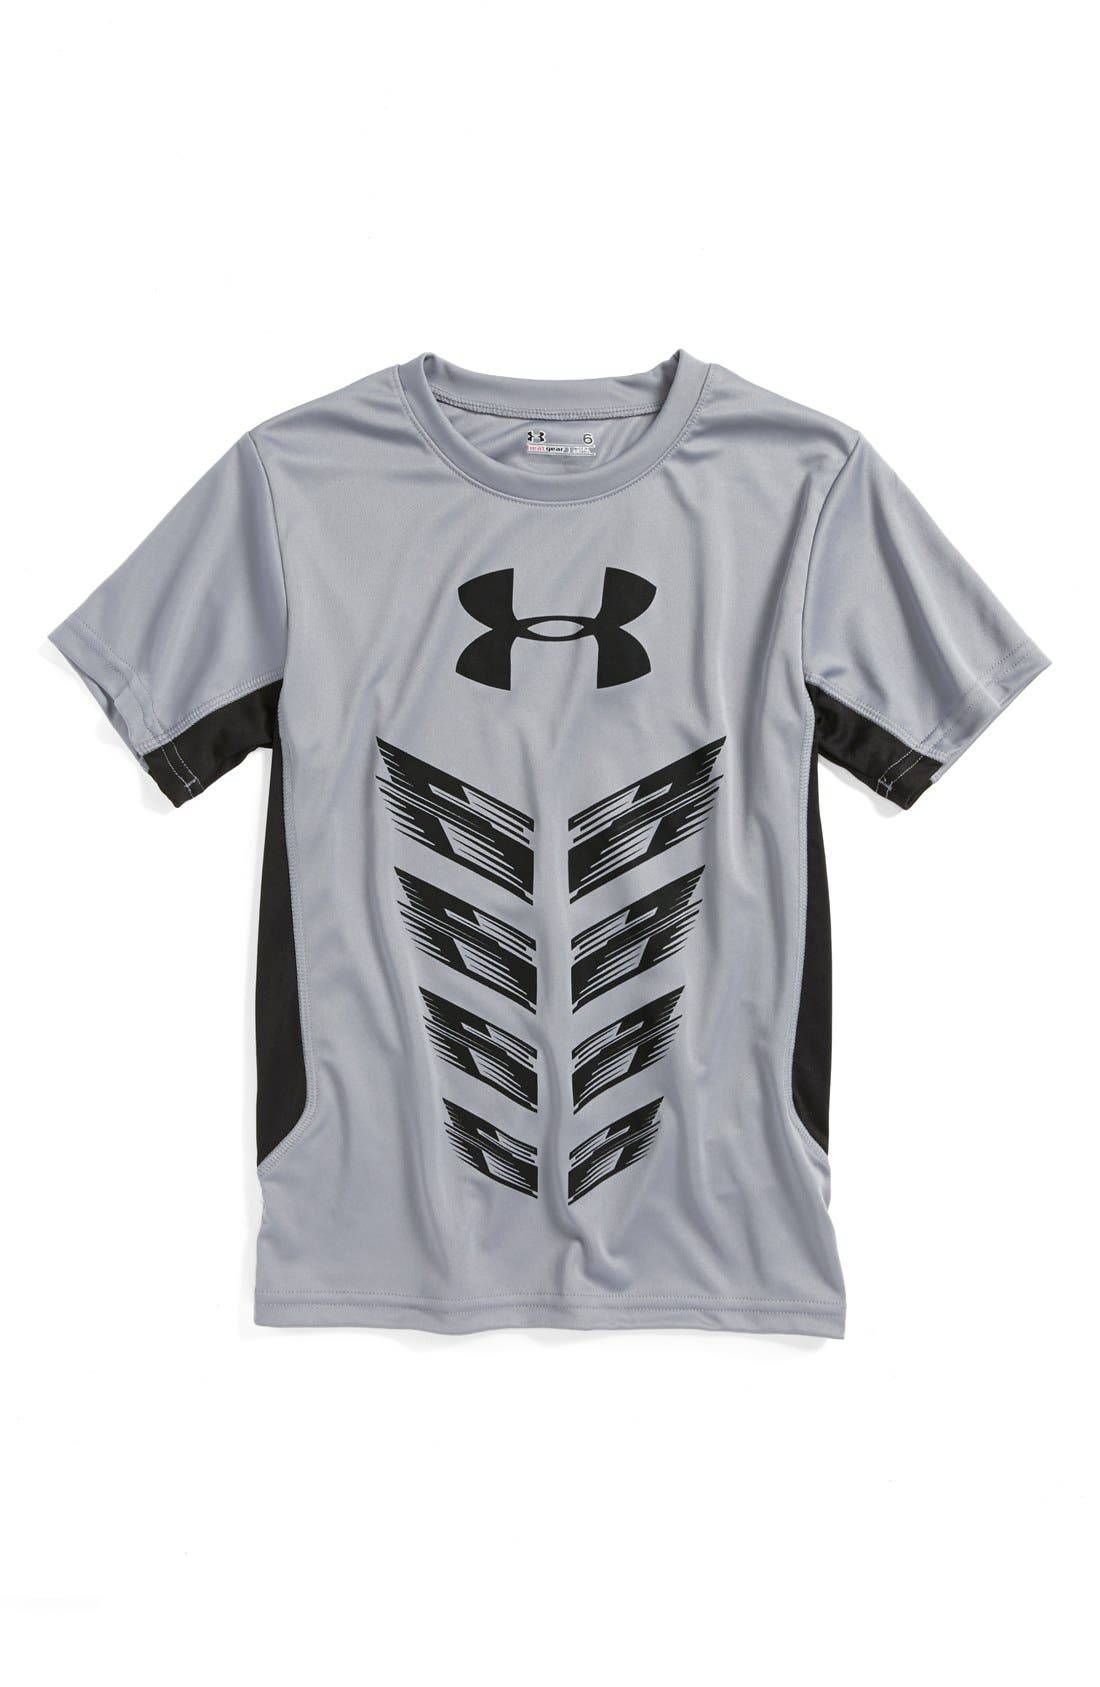 Alternate Image 1 Selected - Under Armour 'Next Level' HeatGear® T-Shirt (Little Boys)